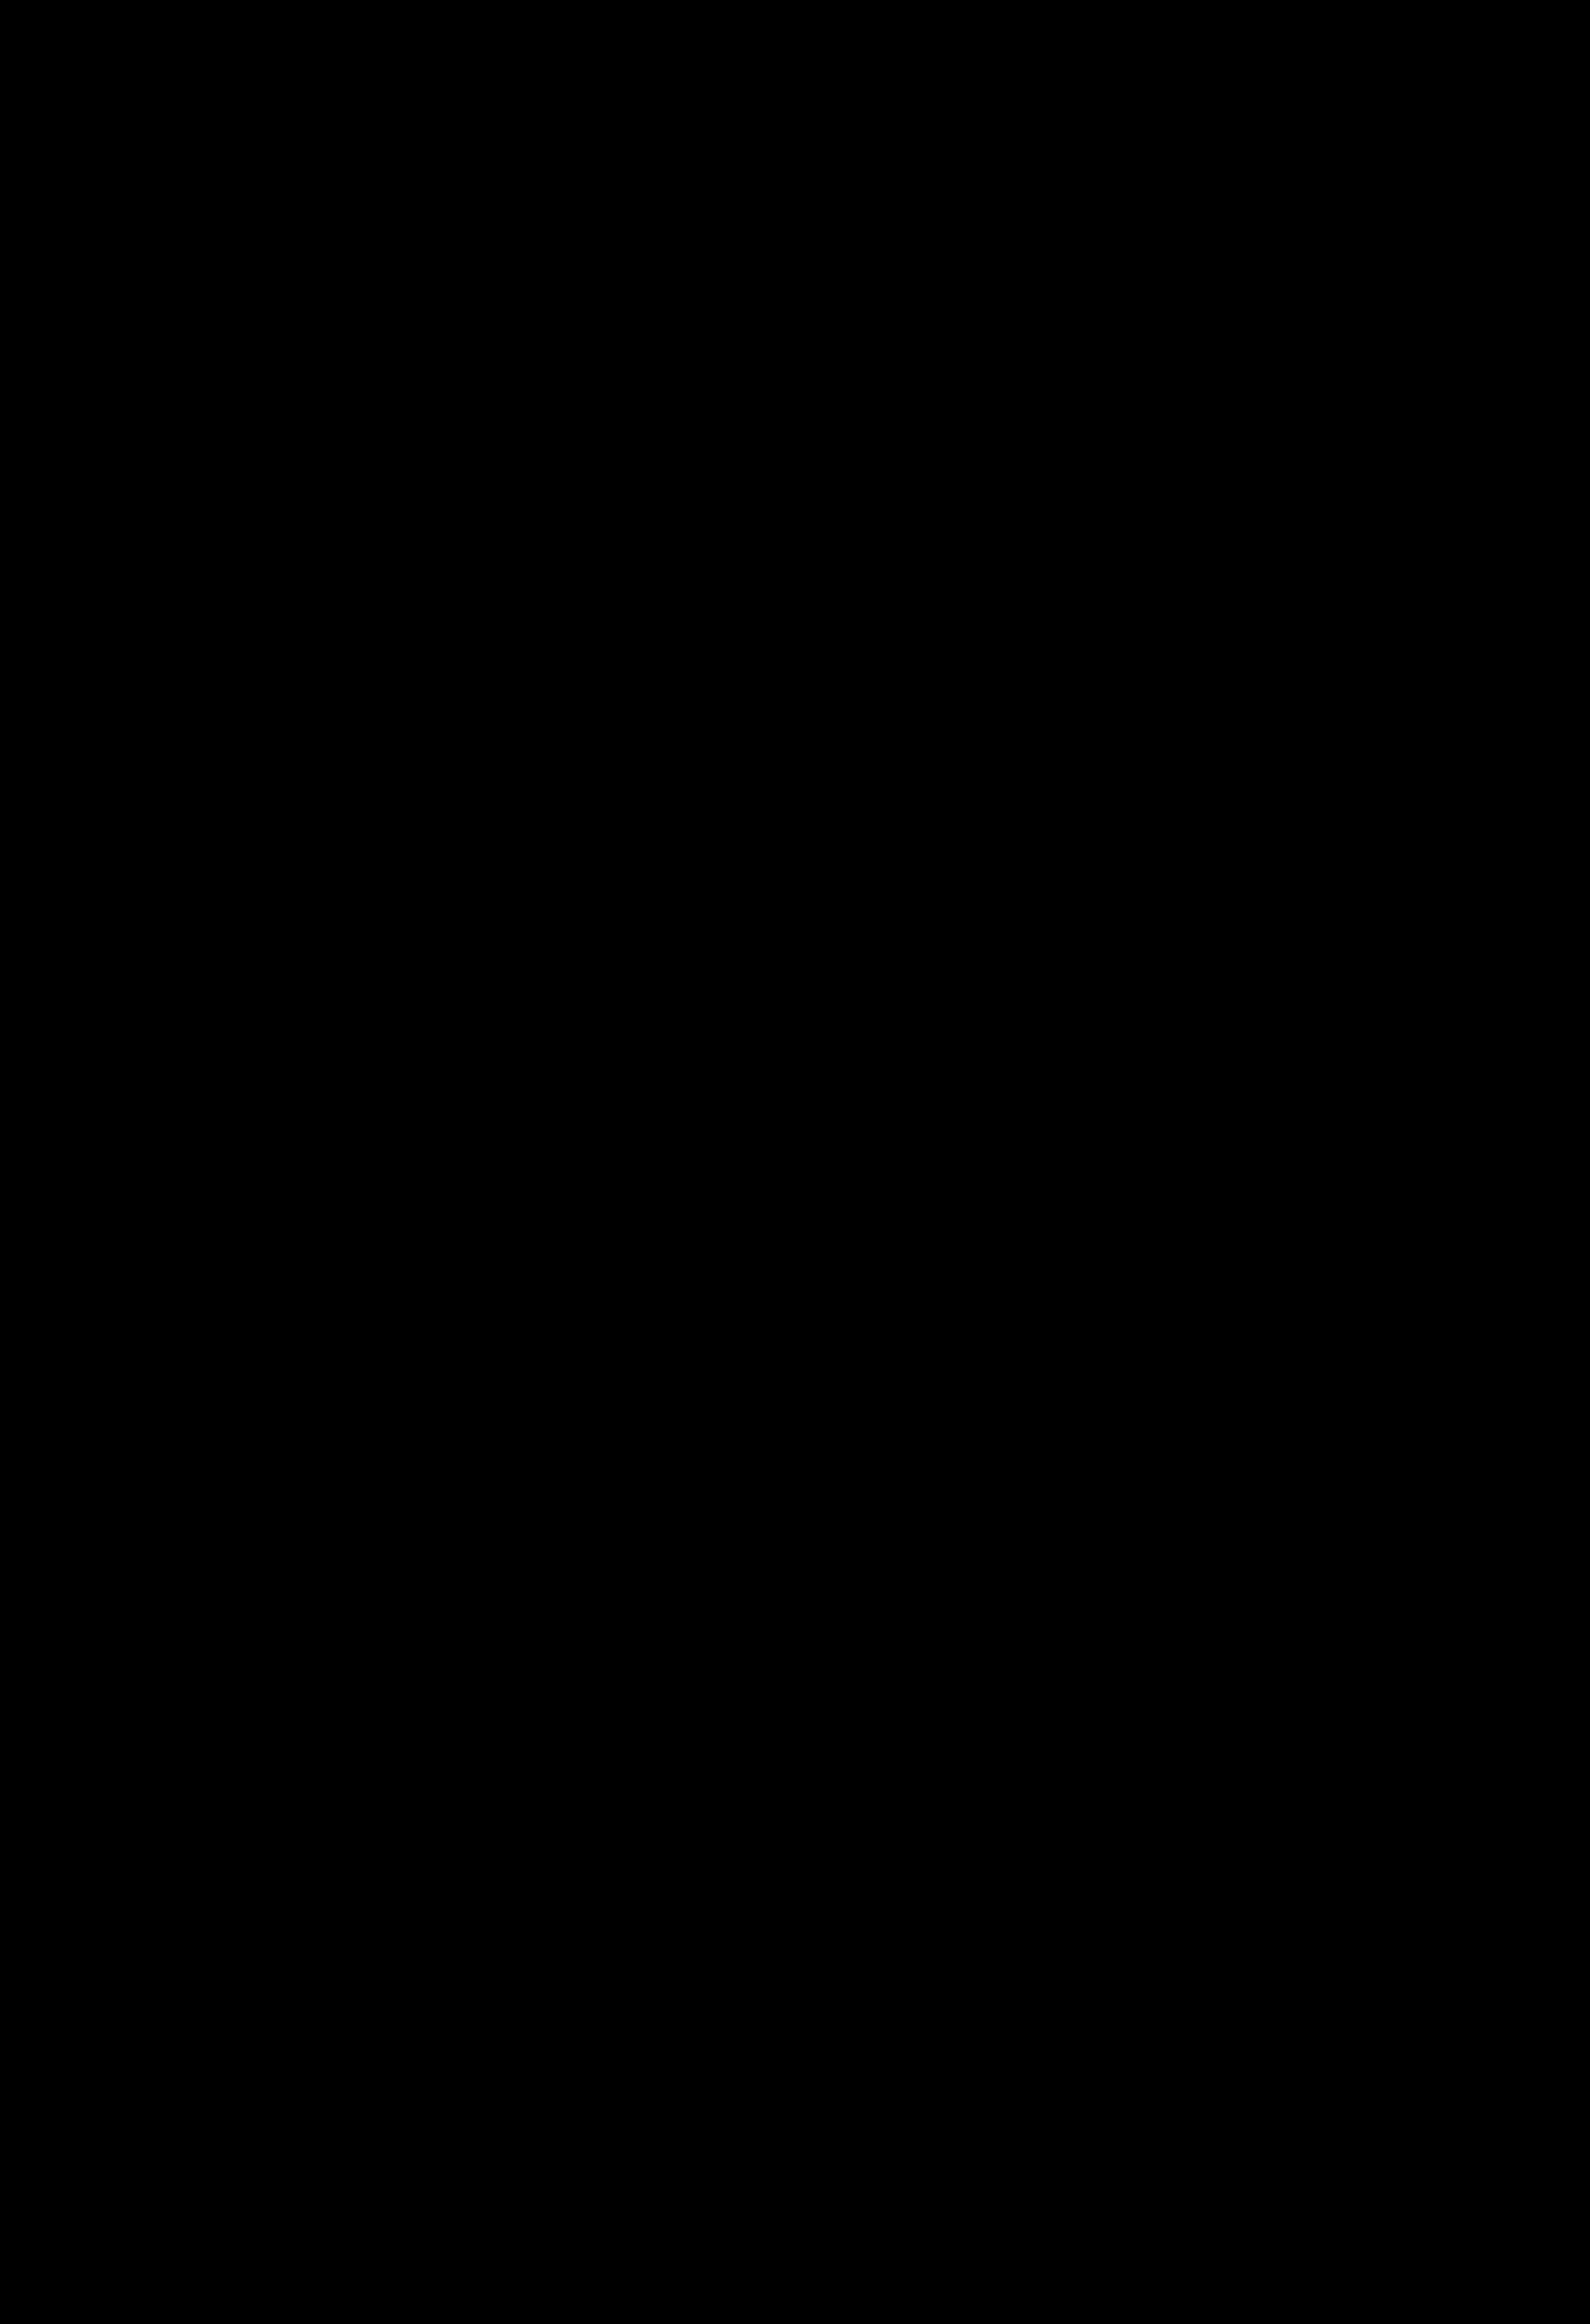 Ultimate Gogeta Lineart By Snakou On Deviantart Interiorhalloweenco